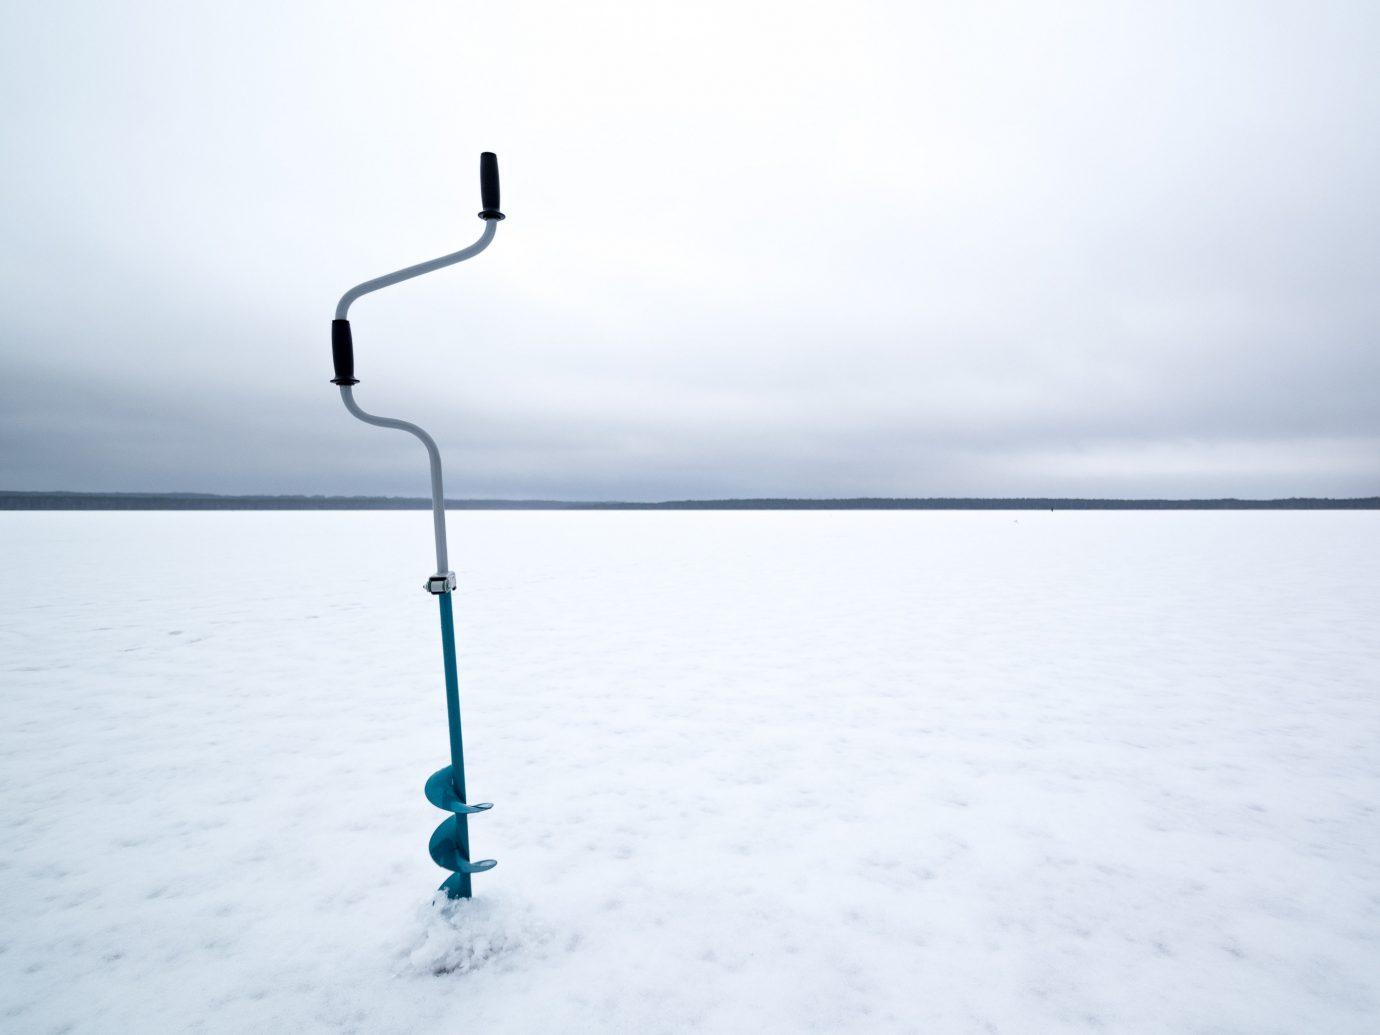 water sky outdoor horizon Sea calm cloud snow Winter freezing arctic ice shore